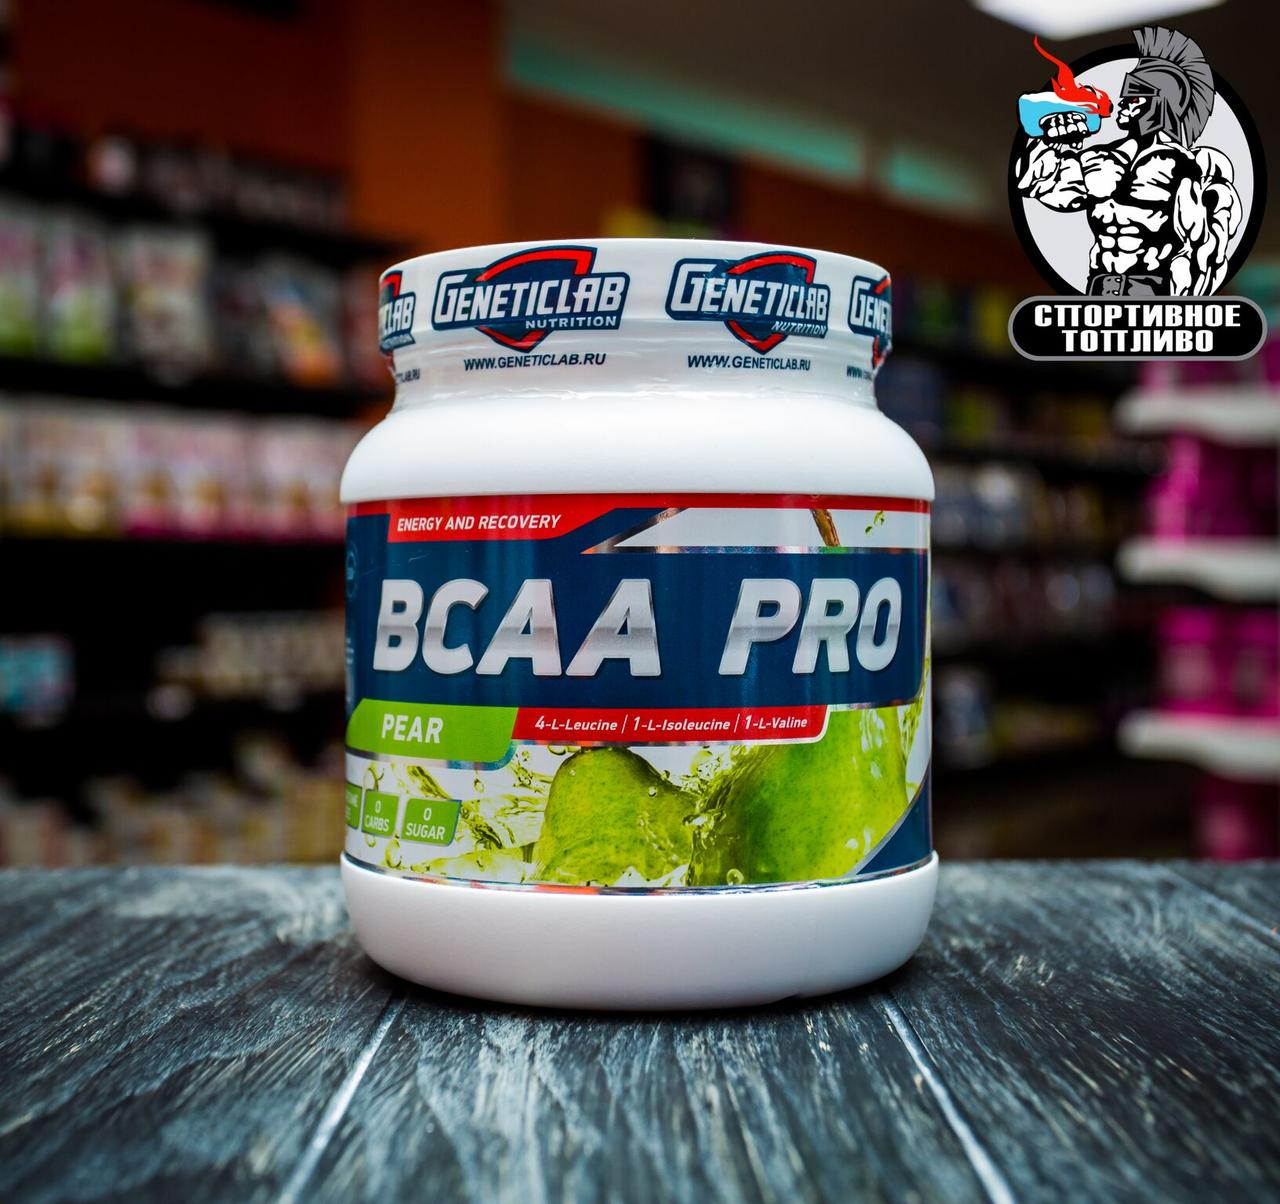 GeneticLab - BCAA PRO powder 4-1-1 500гр/40порций